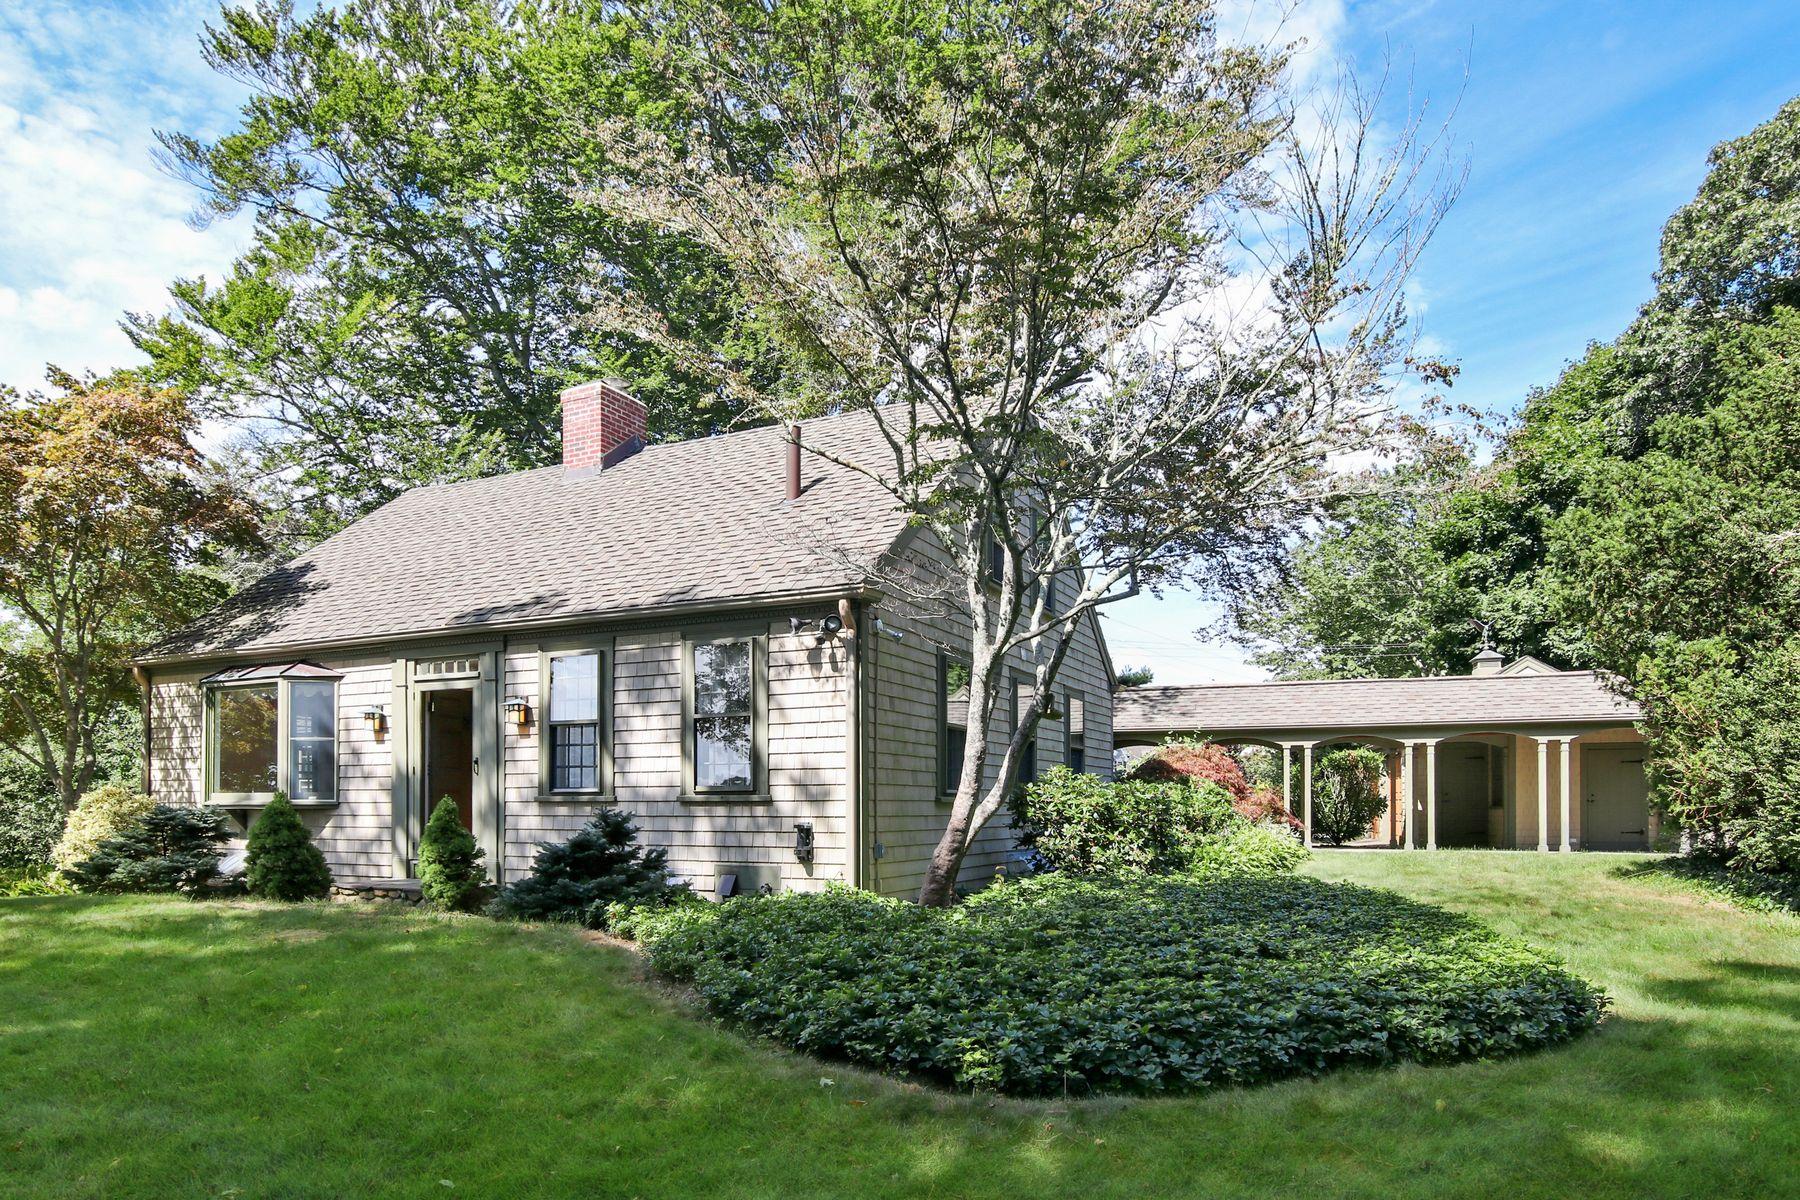 Single Family Homes 为 销售 在 124 Siders Pond Road, Falmouth, MA 124 Siders Pond Road 法尔茅斯, 马萨诸塞州 02540 美国